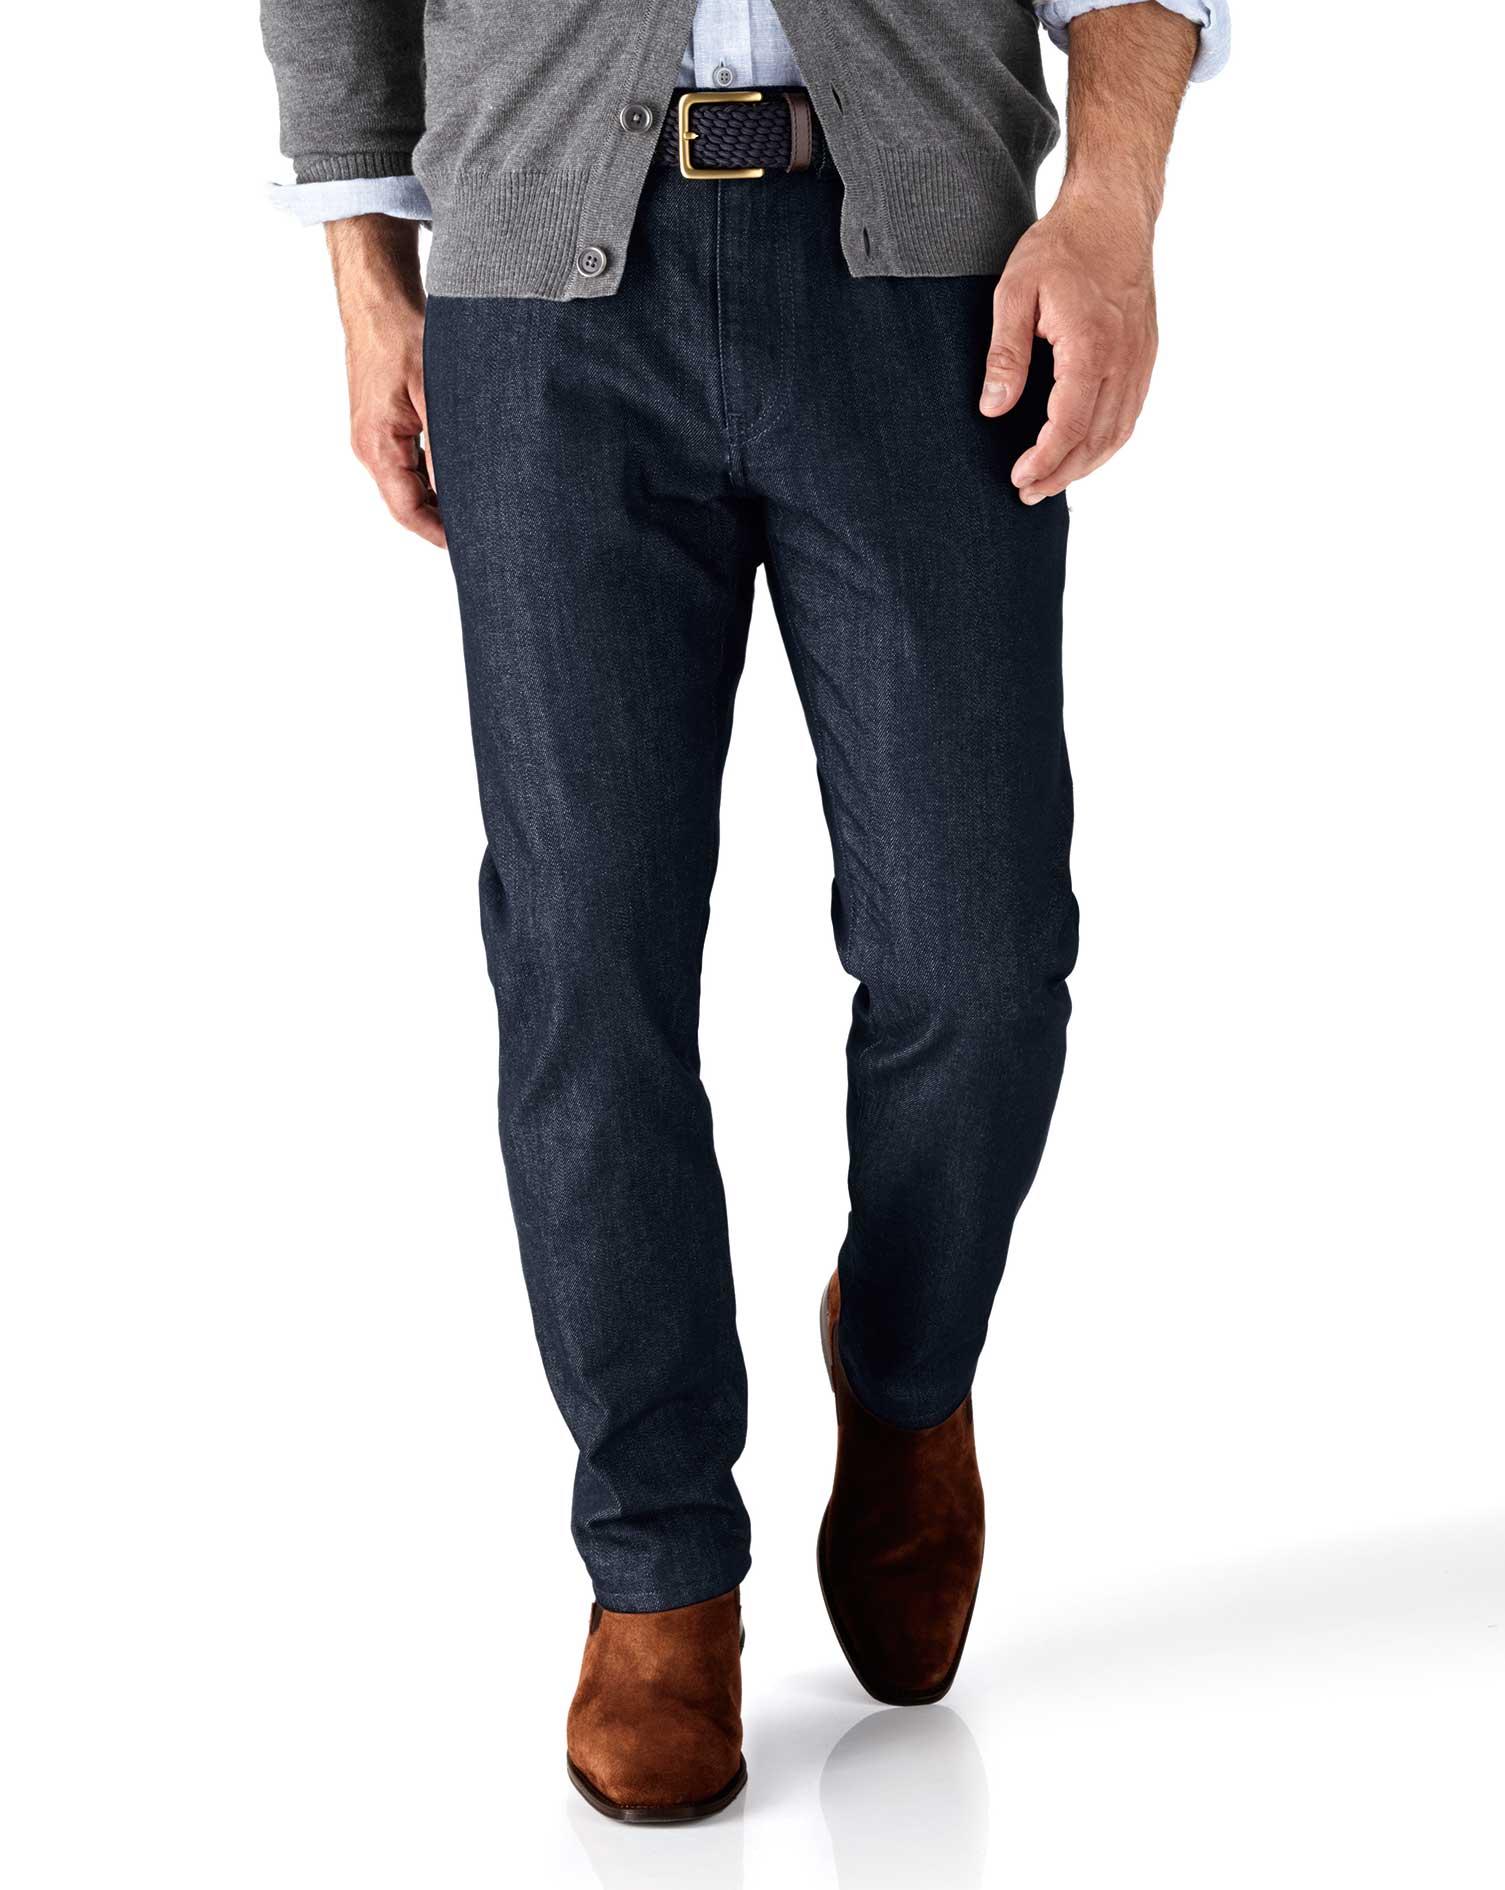 Dark Blue Slim Fit 5 Pocket Denim Jeans Size W30 L30 by Charles Tyrwhitt